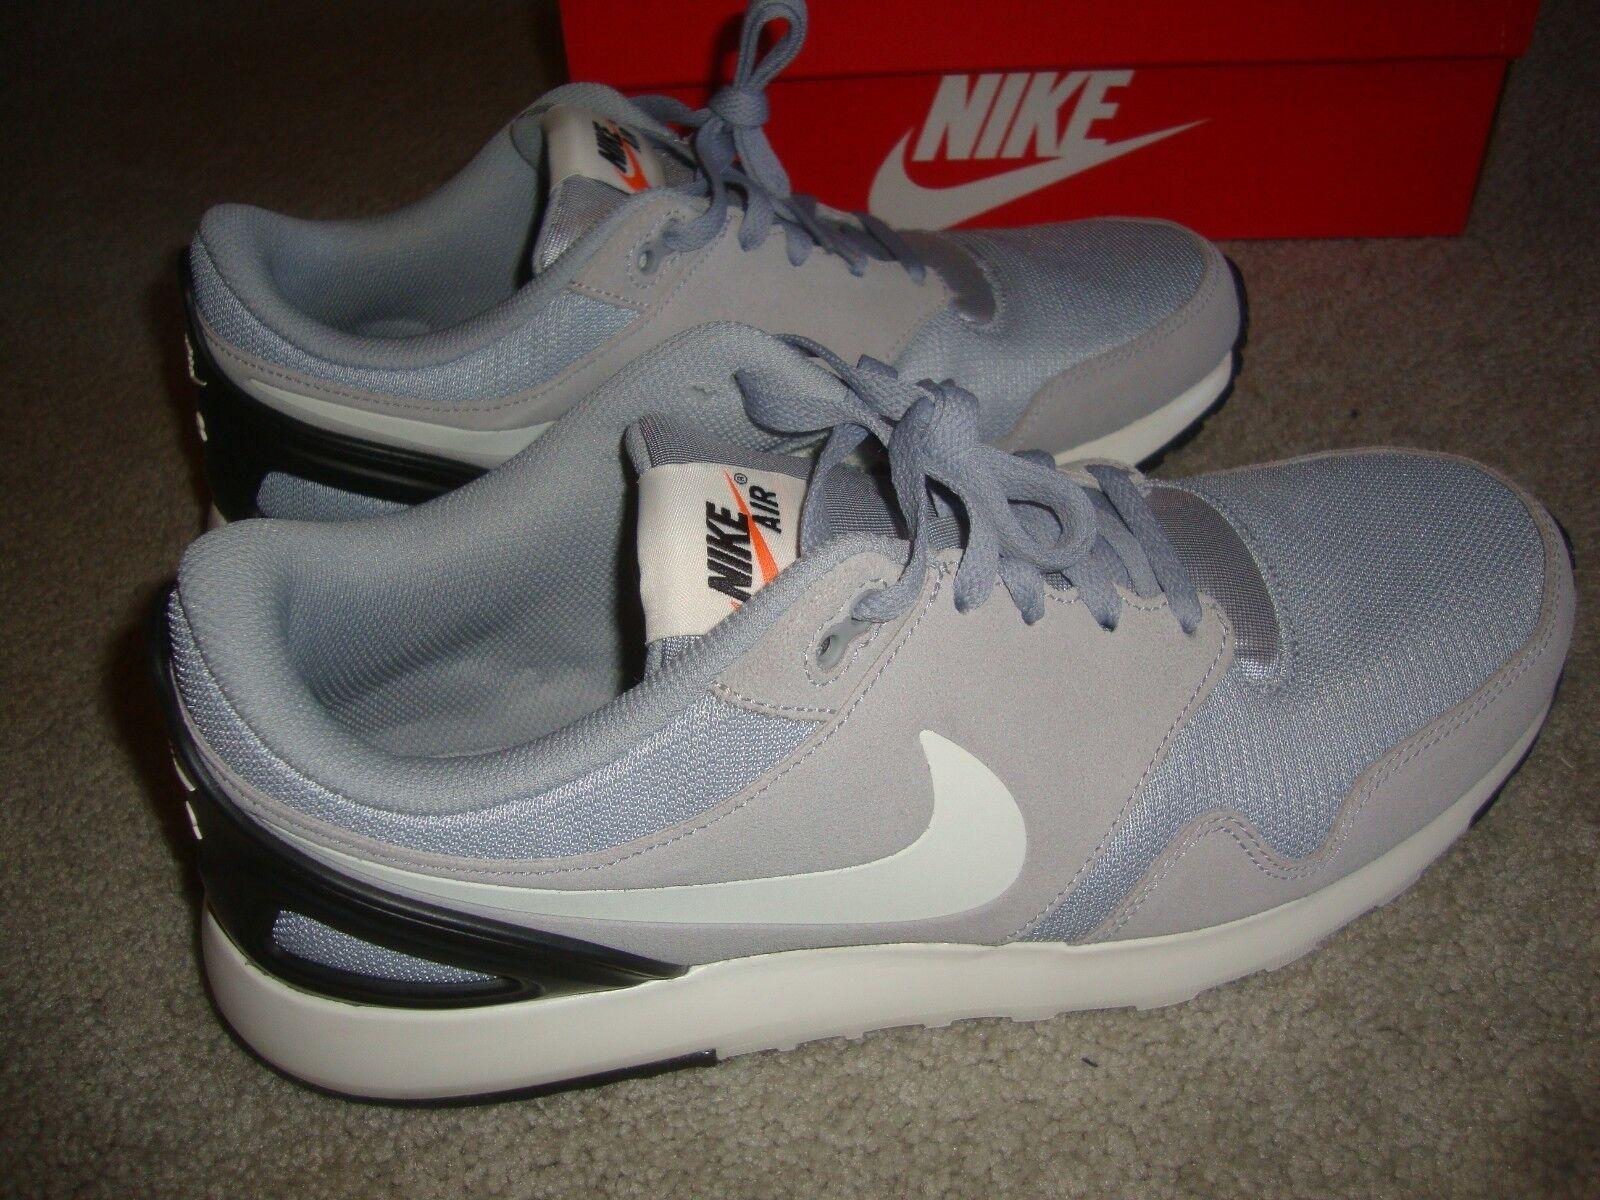 Nike air vibenna scarpe taglia 12 866069 002